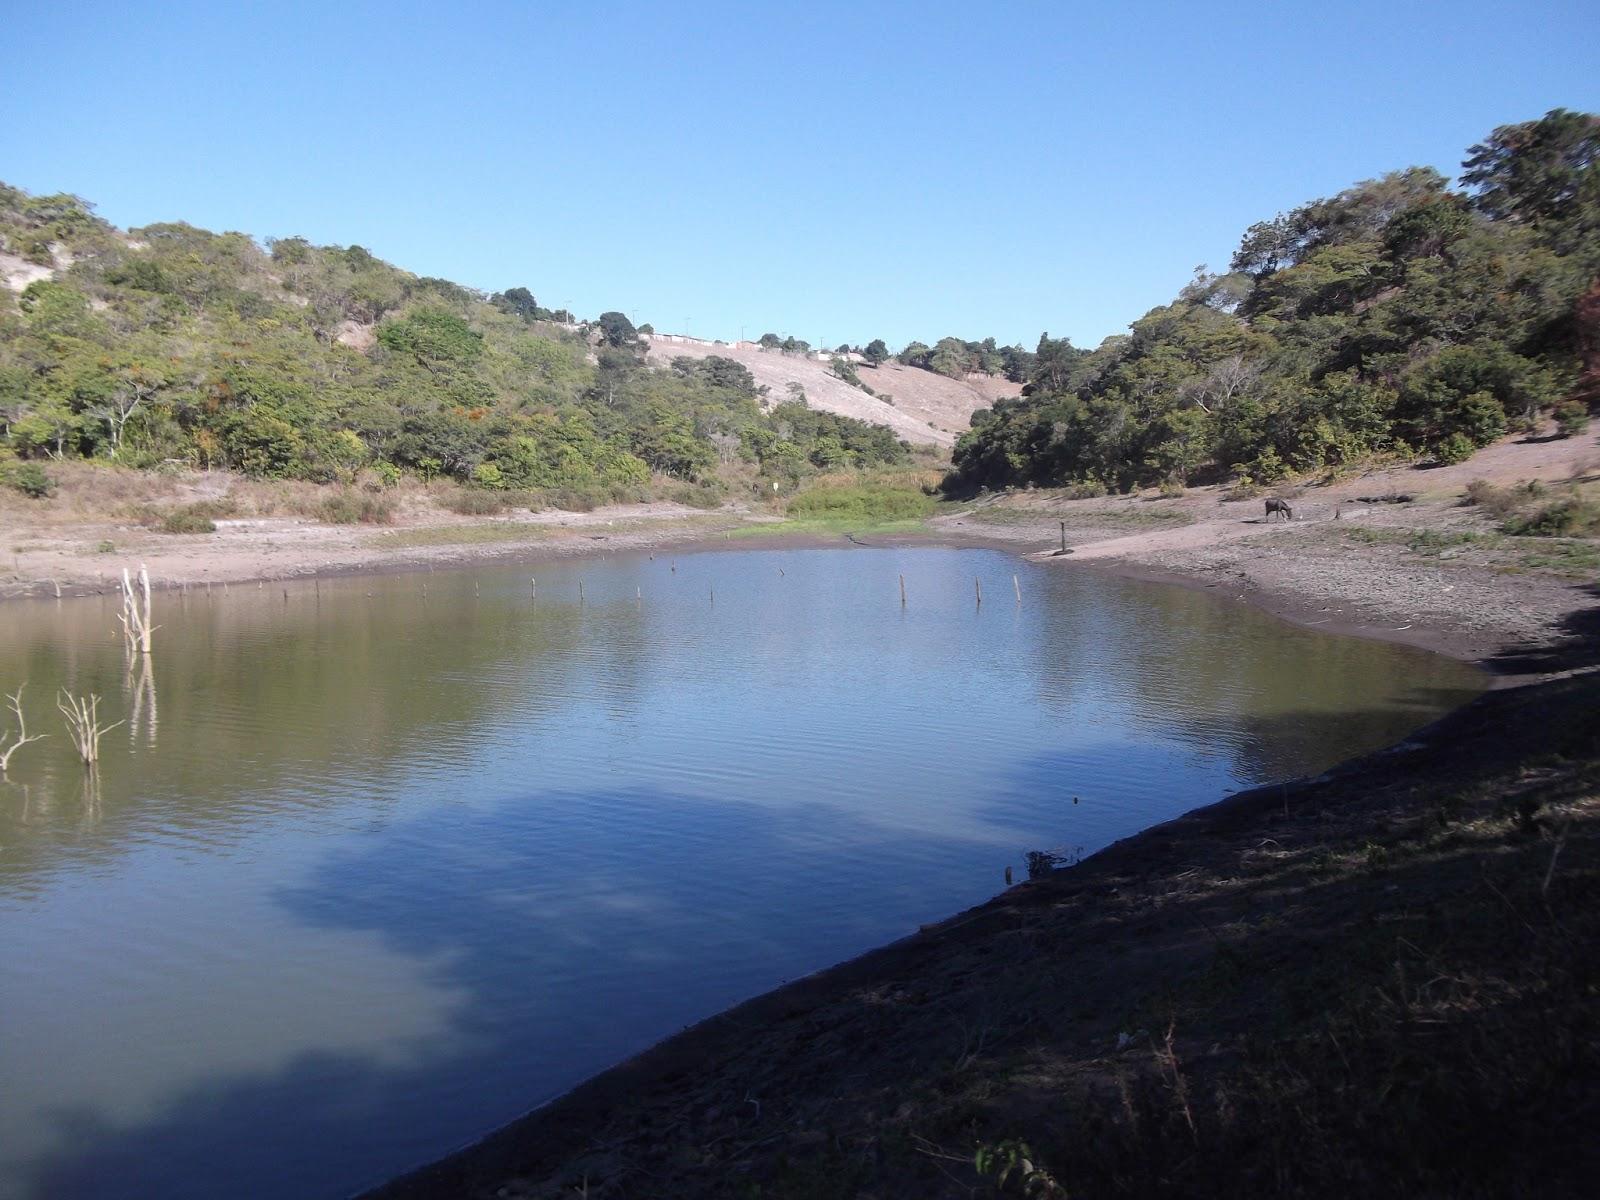 Tapiramut fotos fotos da represa po o bonito e da pra a for Bilder poco